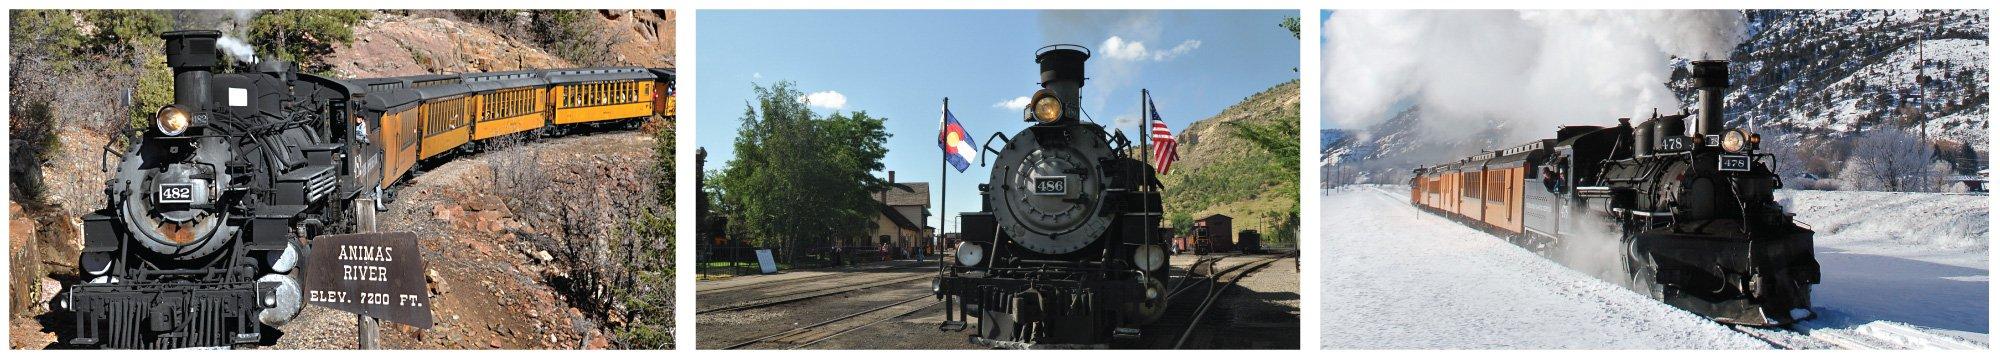 File Photo. The Durango & Silverton Narrow Gauge Railroad.